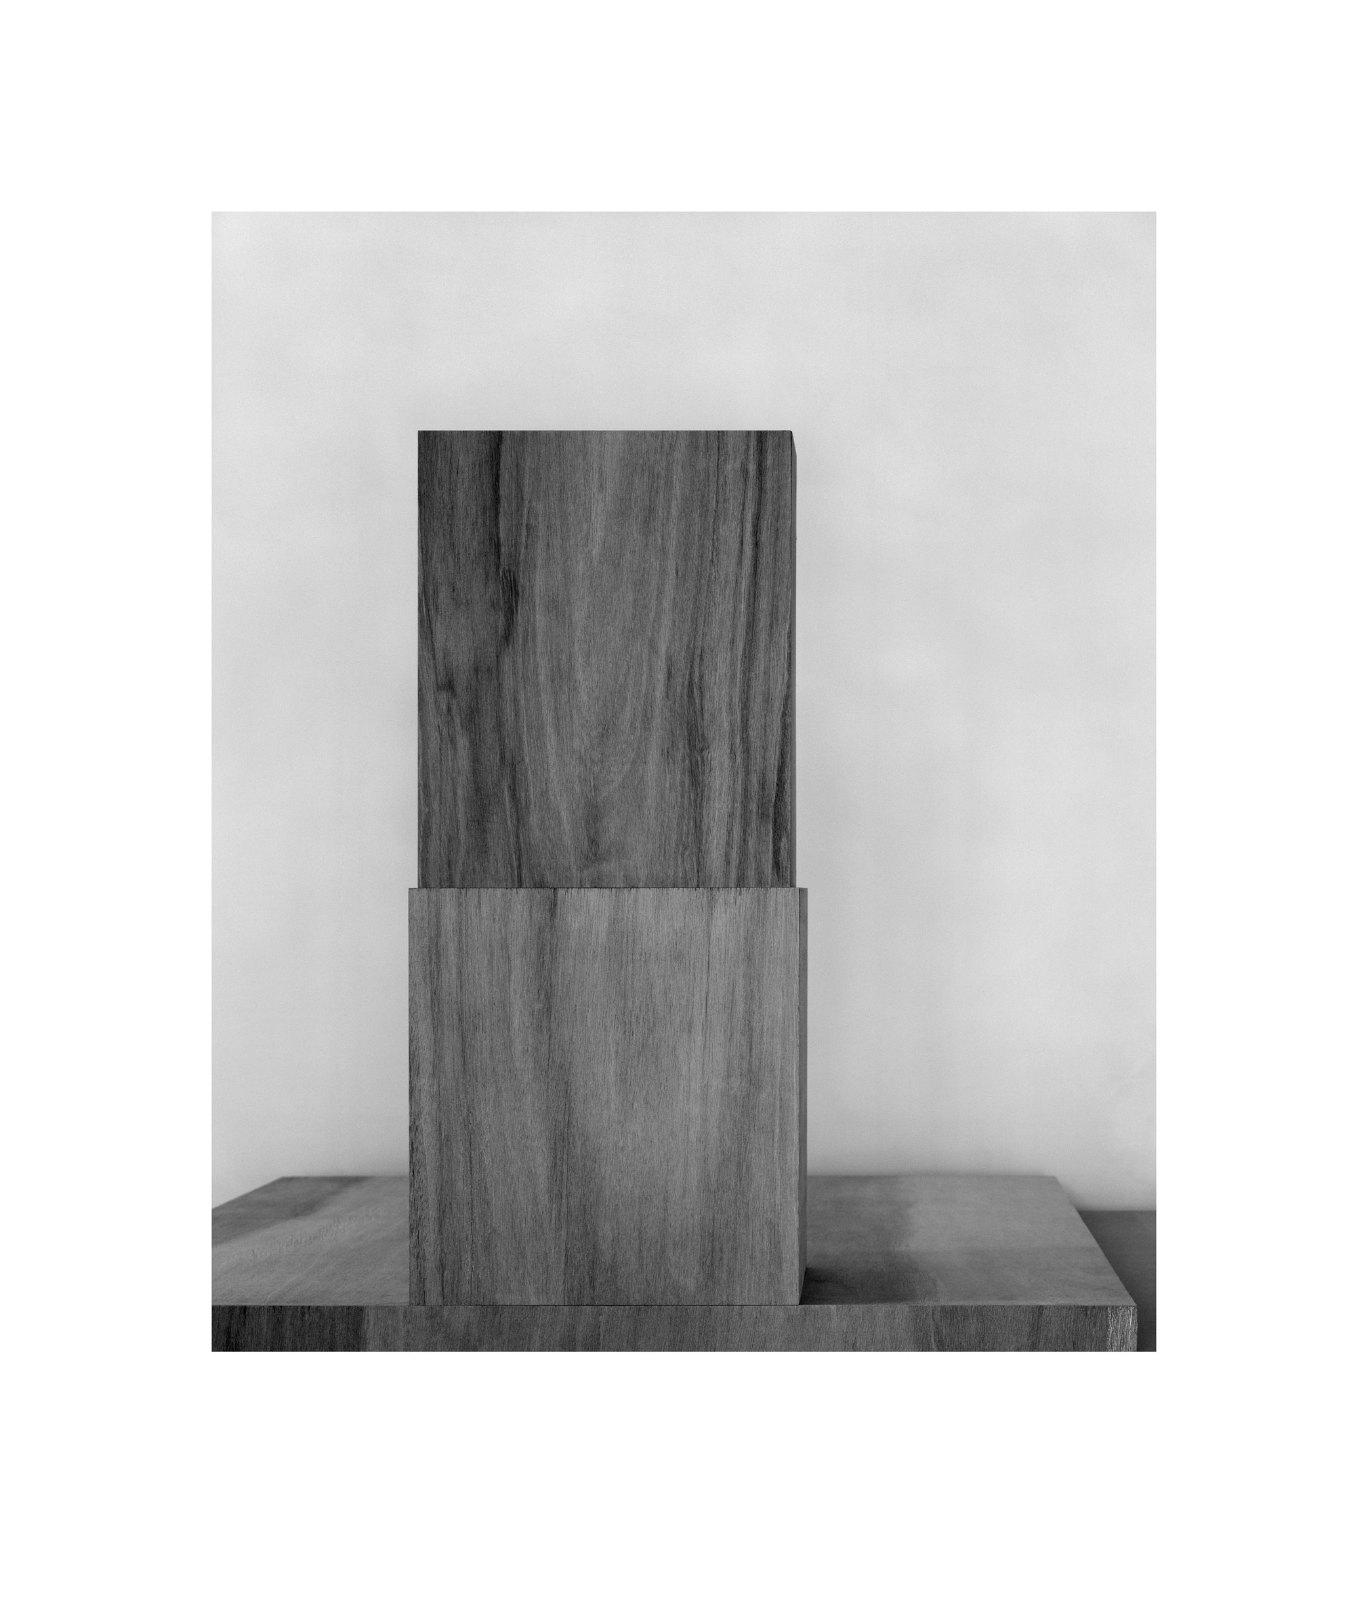 Sett VII – nov. 07, 2007, lambda print, 88 x 75 cm